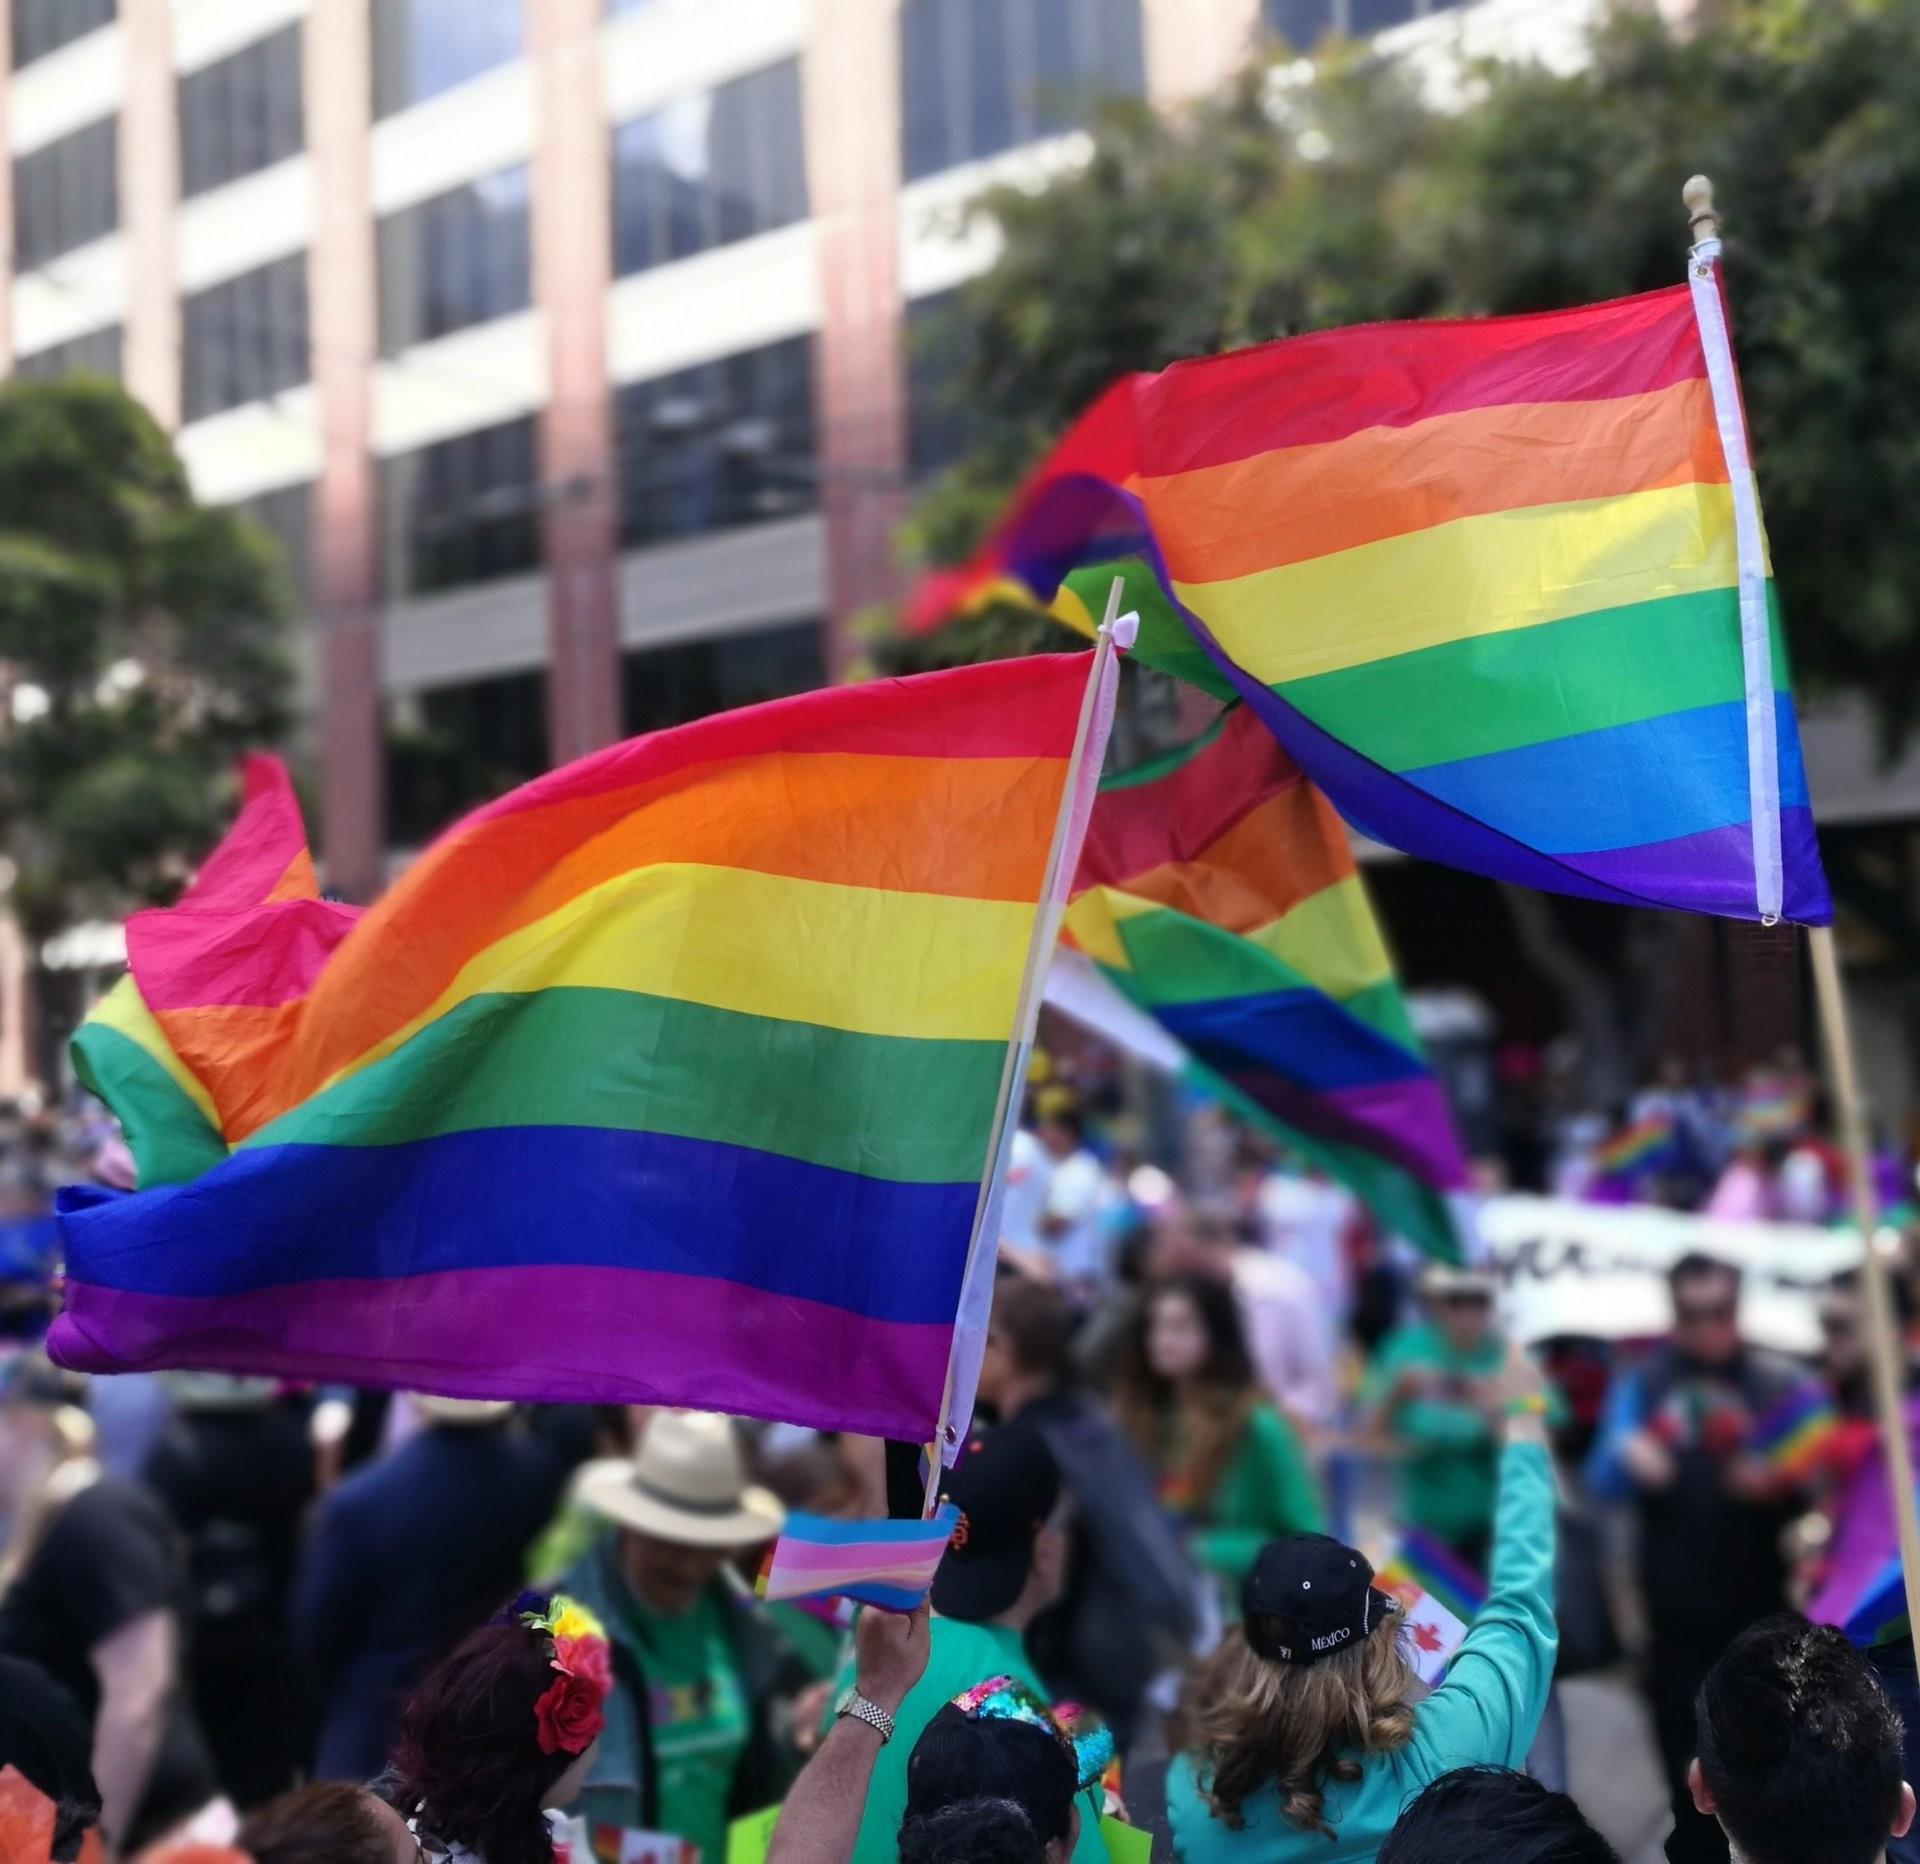 photo of a vibrant pride celebration